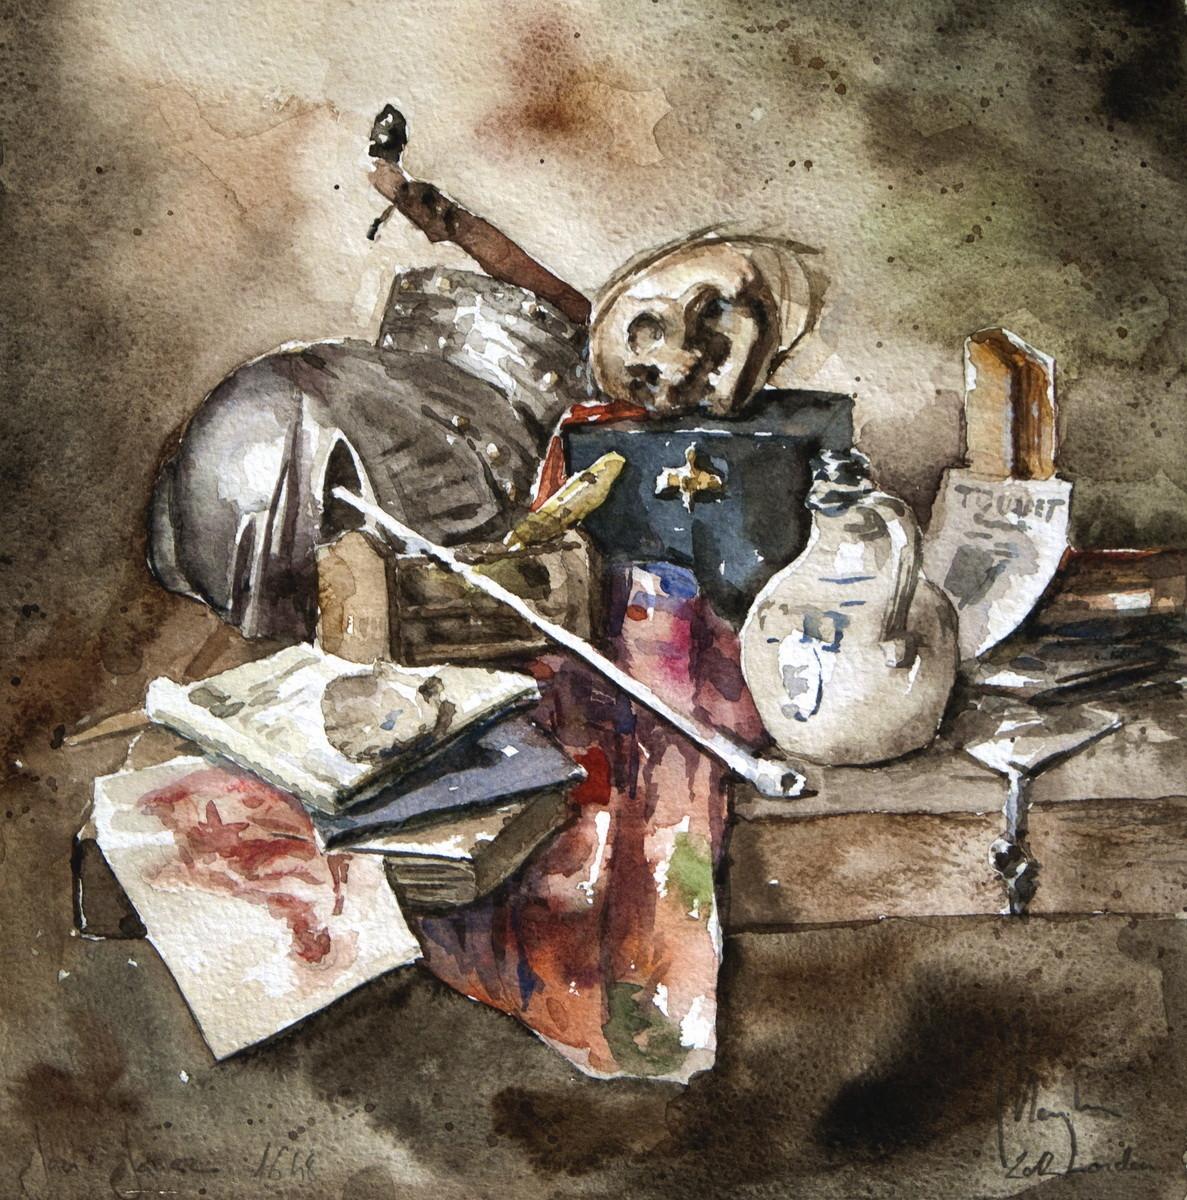 Jan Jansz Study (watercolour, paper) / National Gallery, London